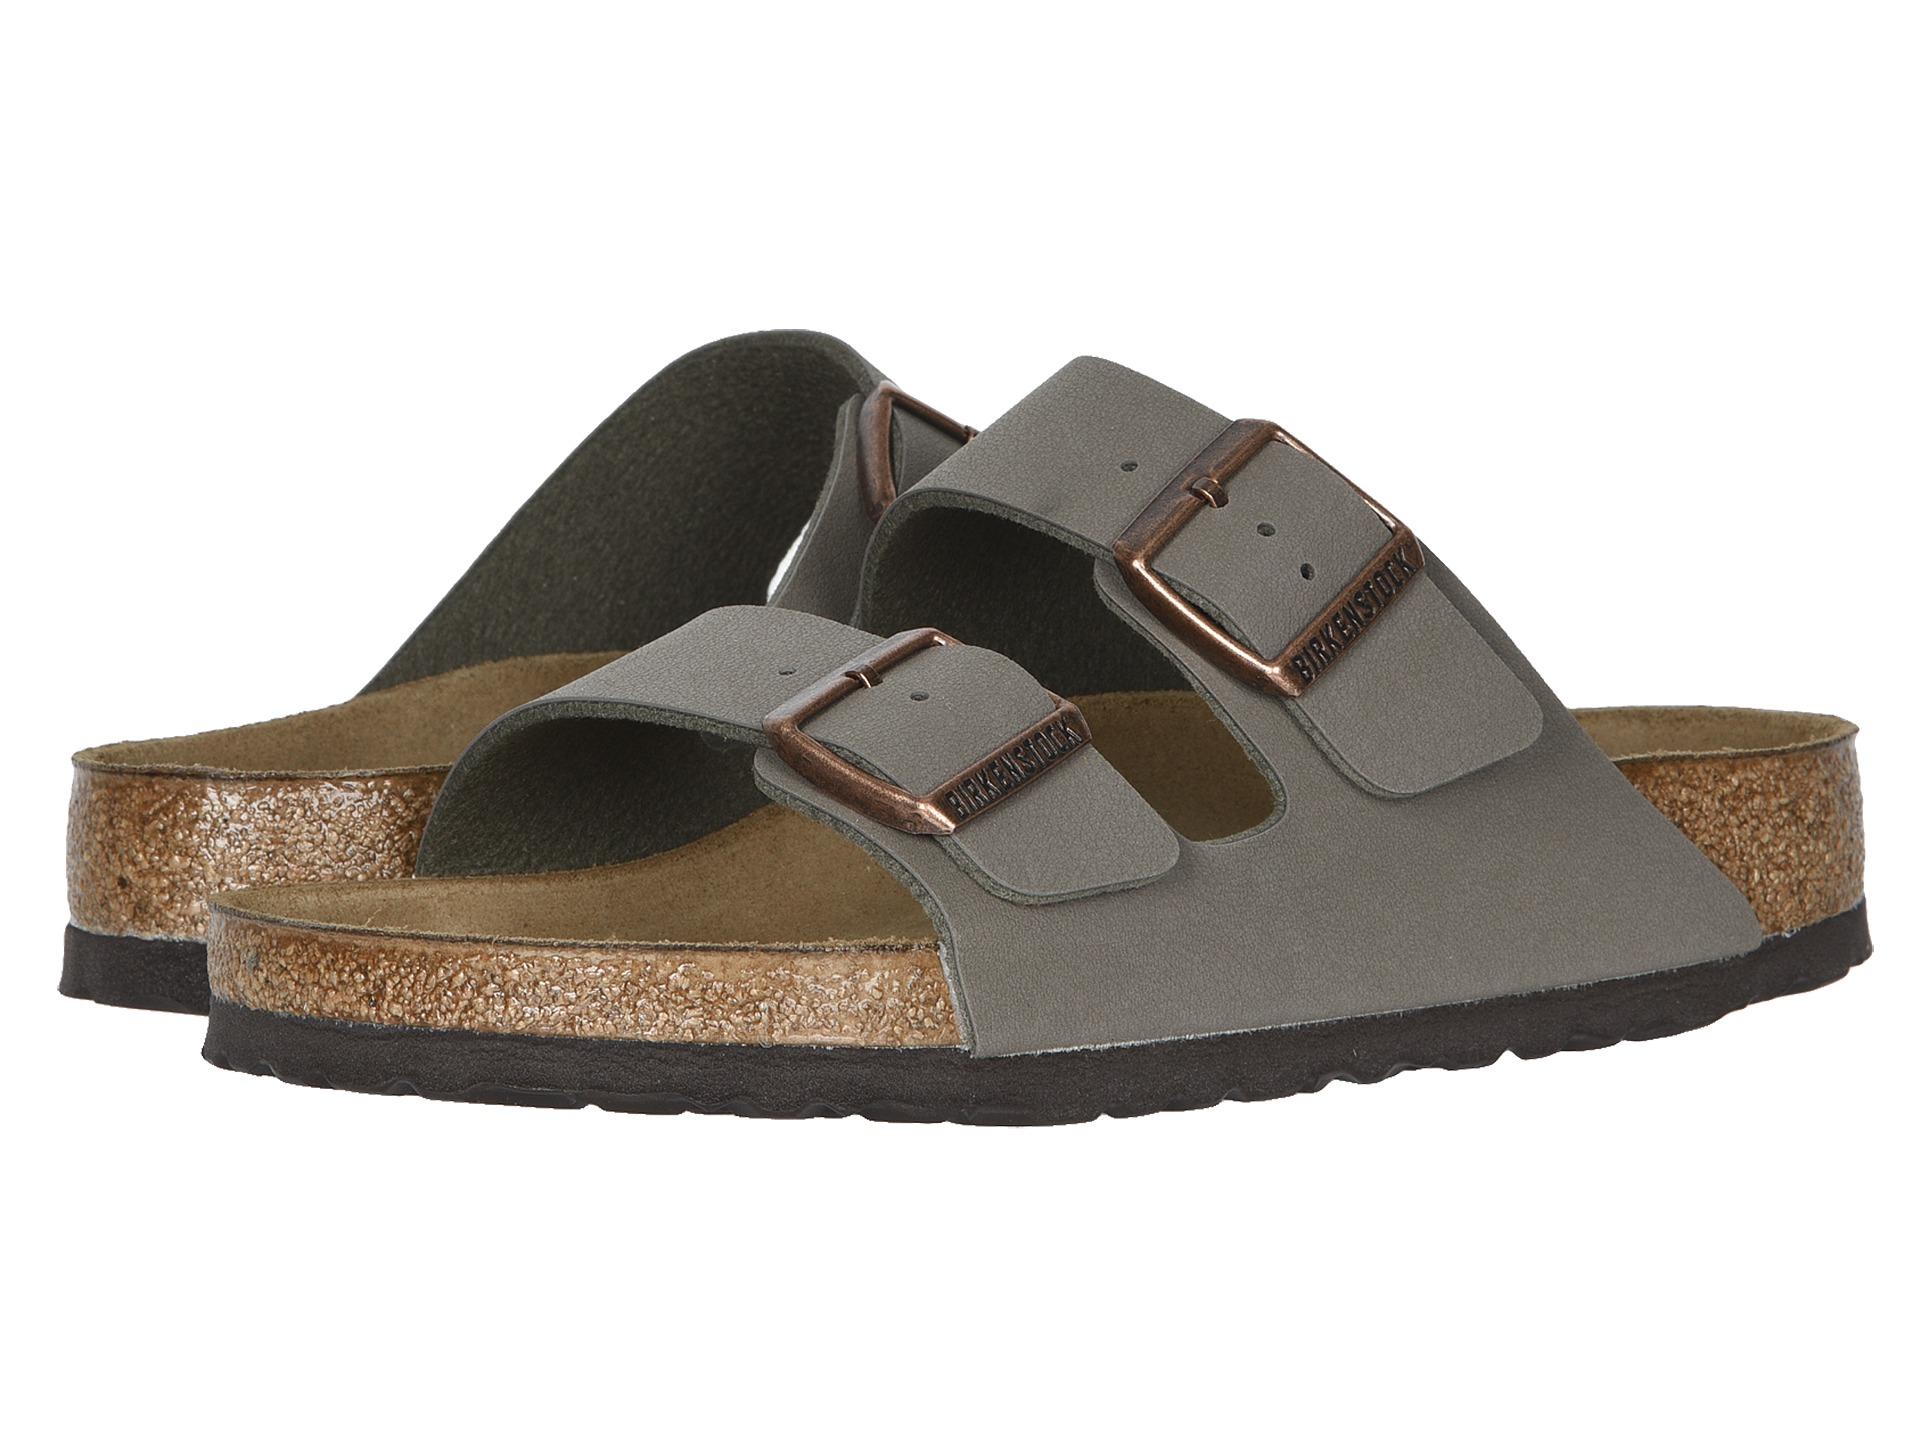 8b4e48240f7c birkenstock unisex arizona sandals women